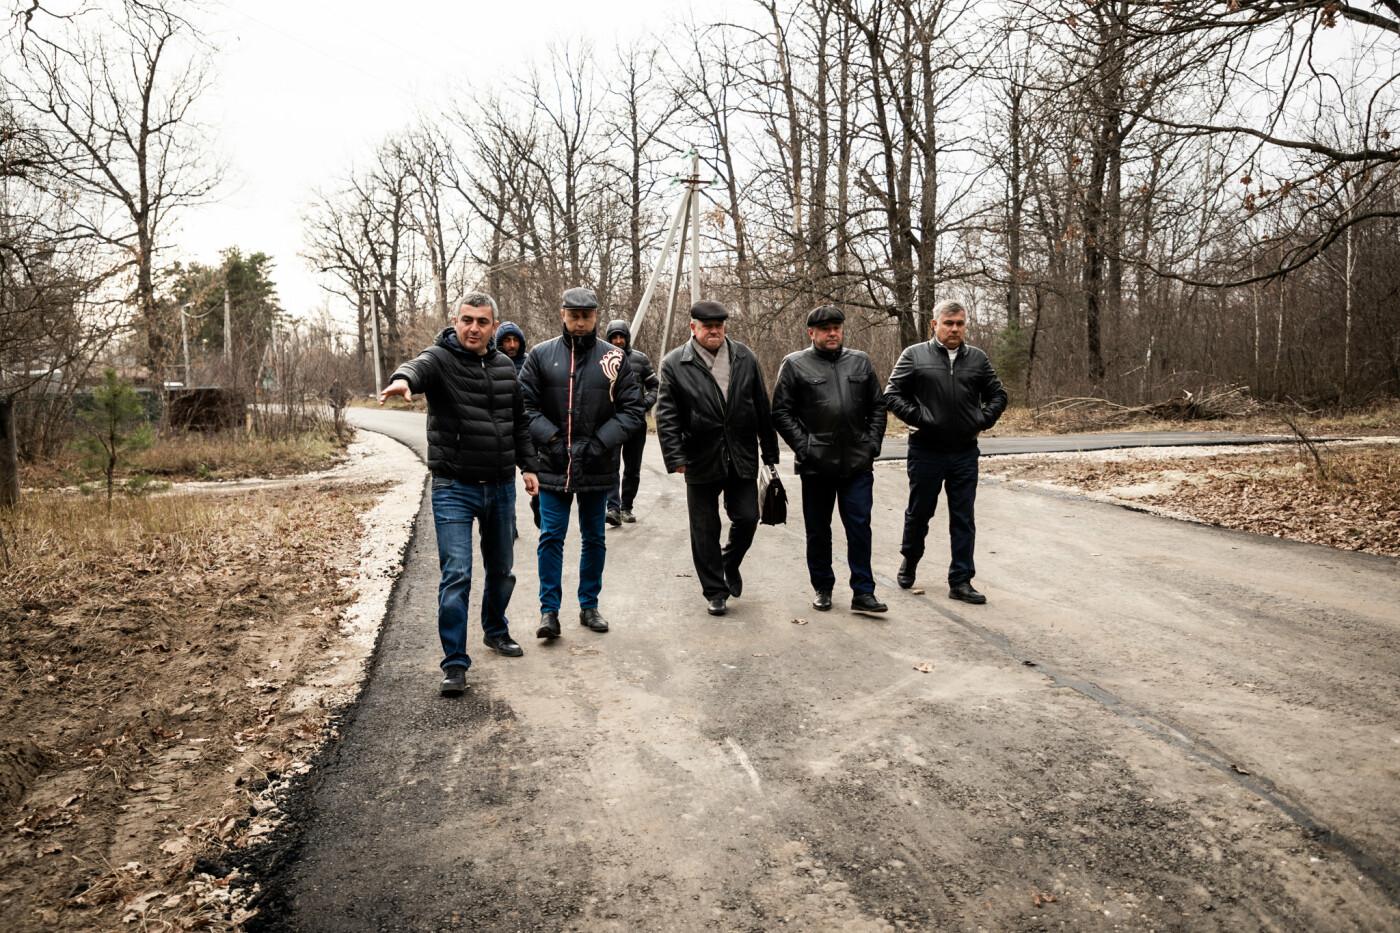 В пригороде Тамбова построили новую дорогу за 3,4 млн рублей, фото-2